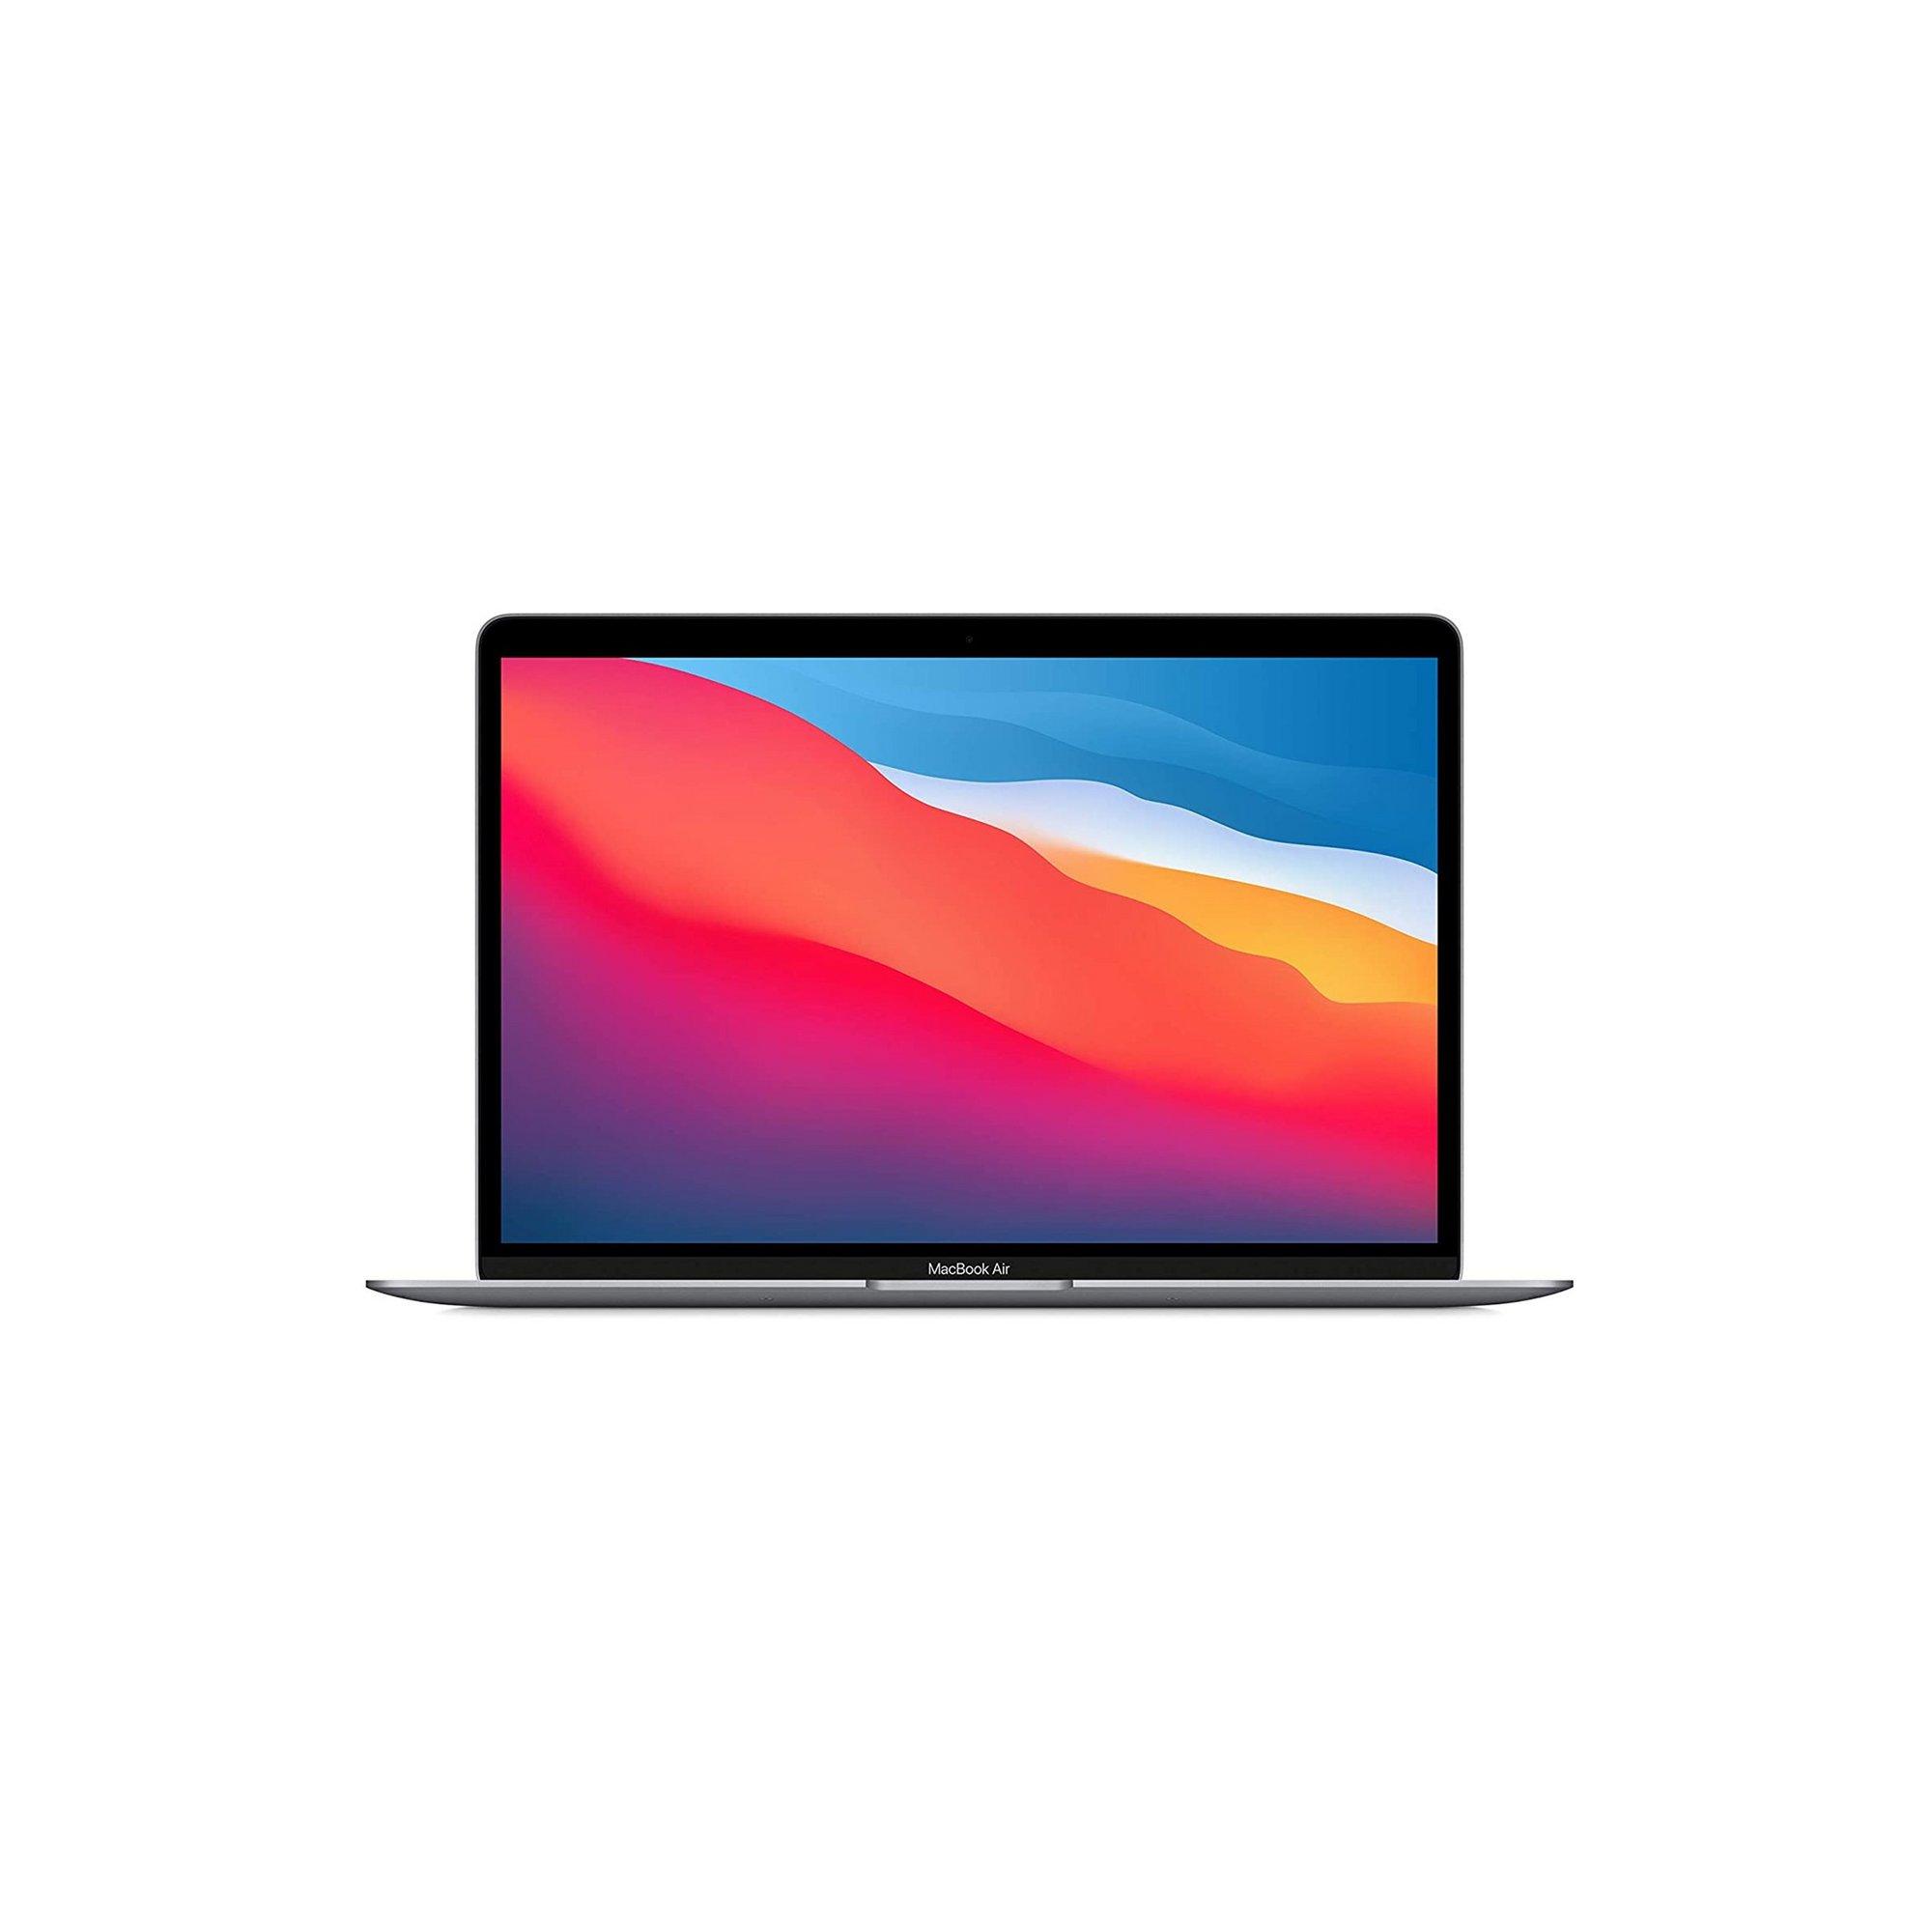 Image of Apple MacBook Air 13 Inch M1 Chip 2020 256GB